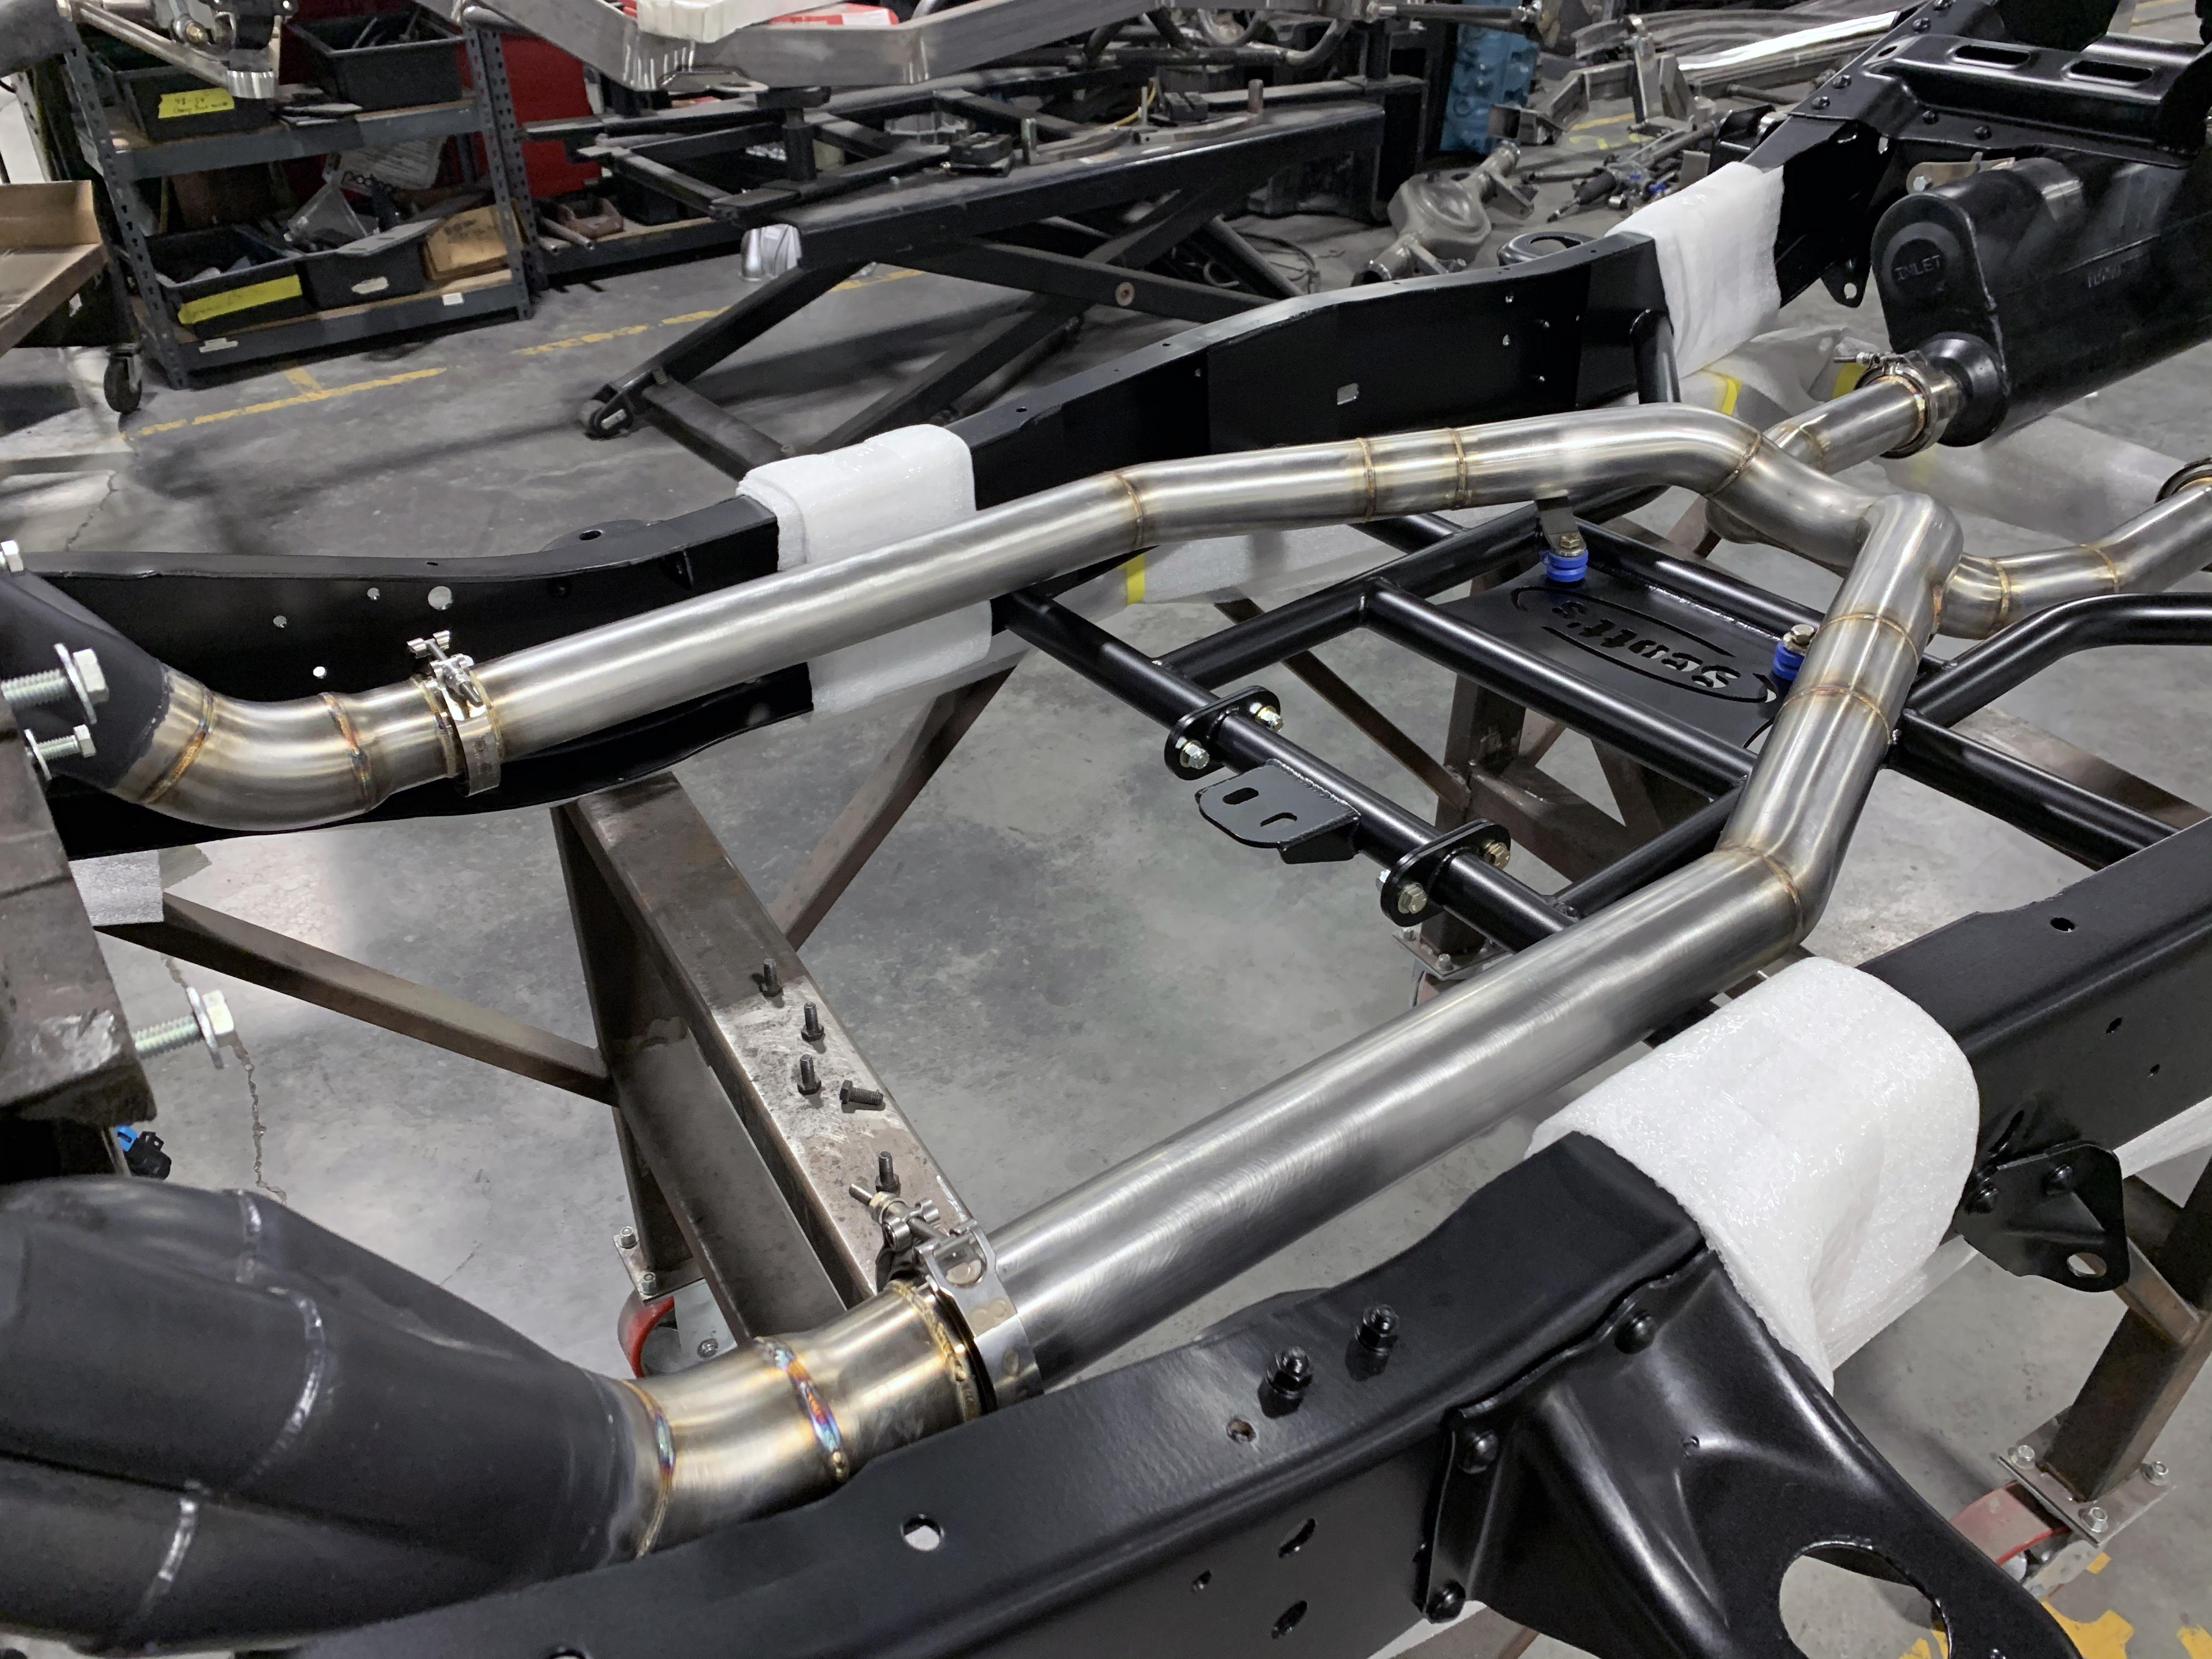 Scotts-Hotrods-82-C10-Blazer-2WD-19